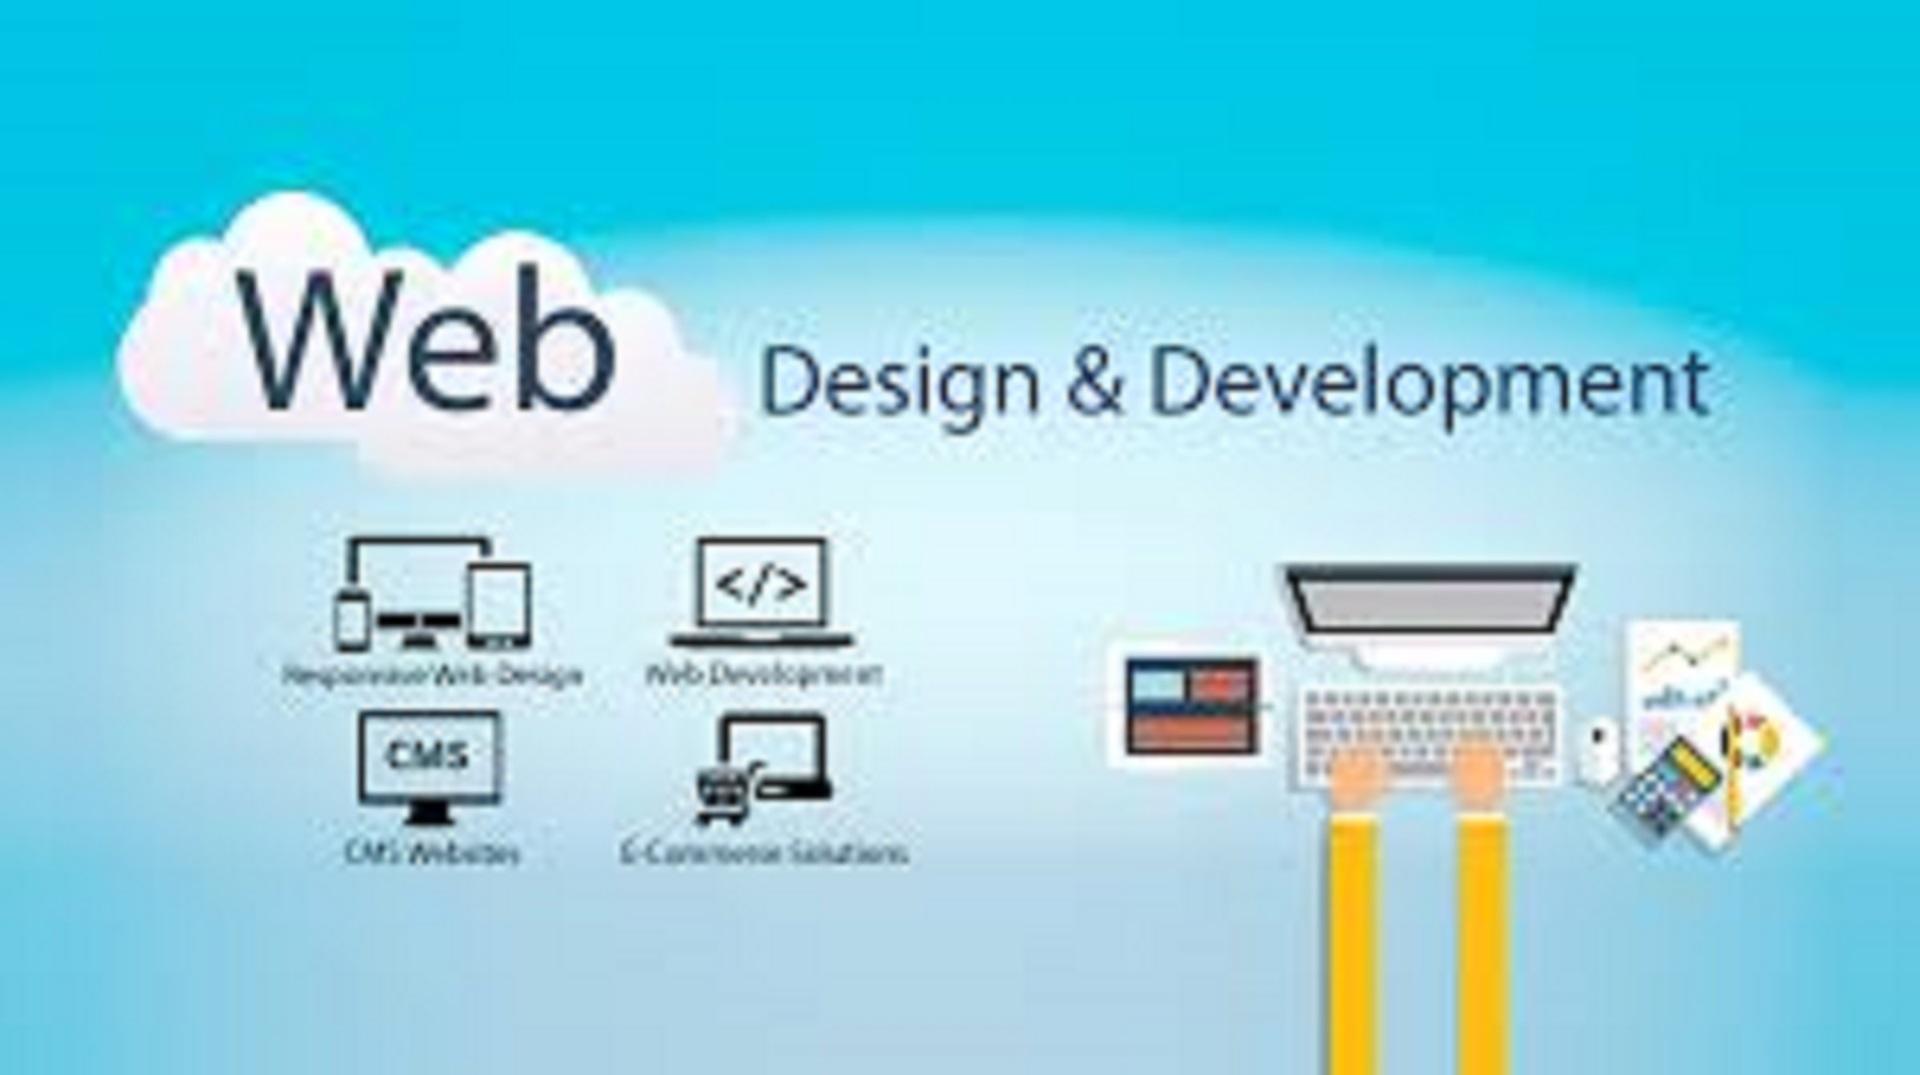 I'm Your Web Developer In Php, Codeigniter, Database, Wordpress